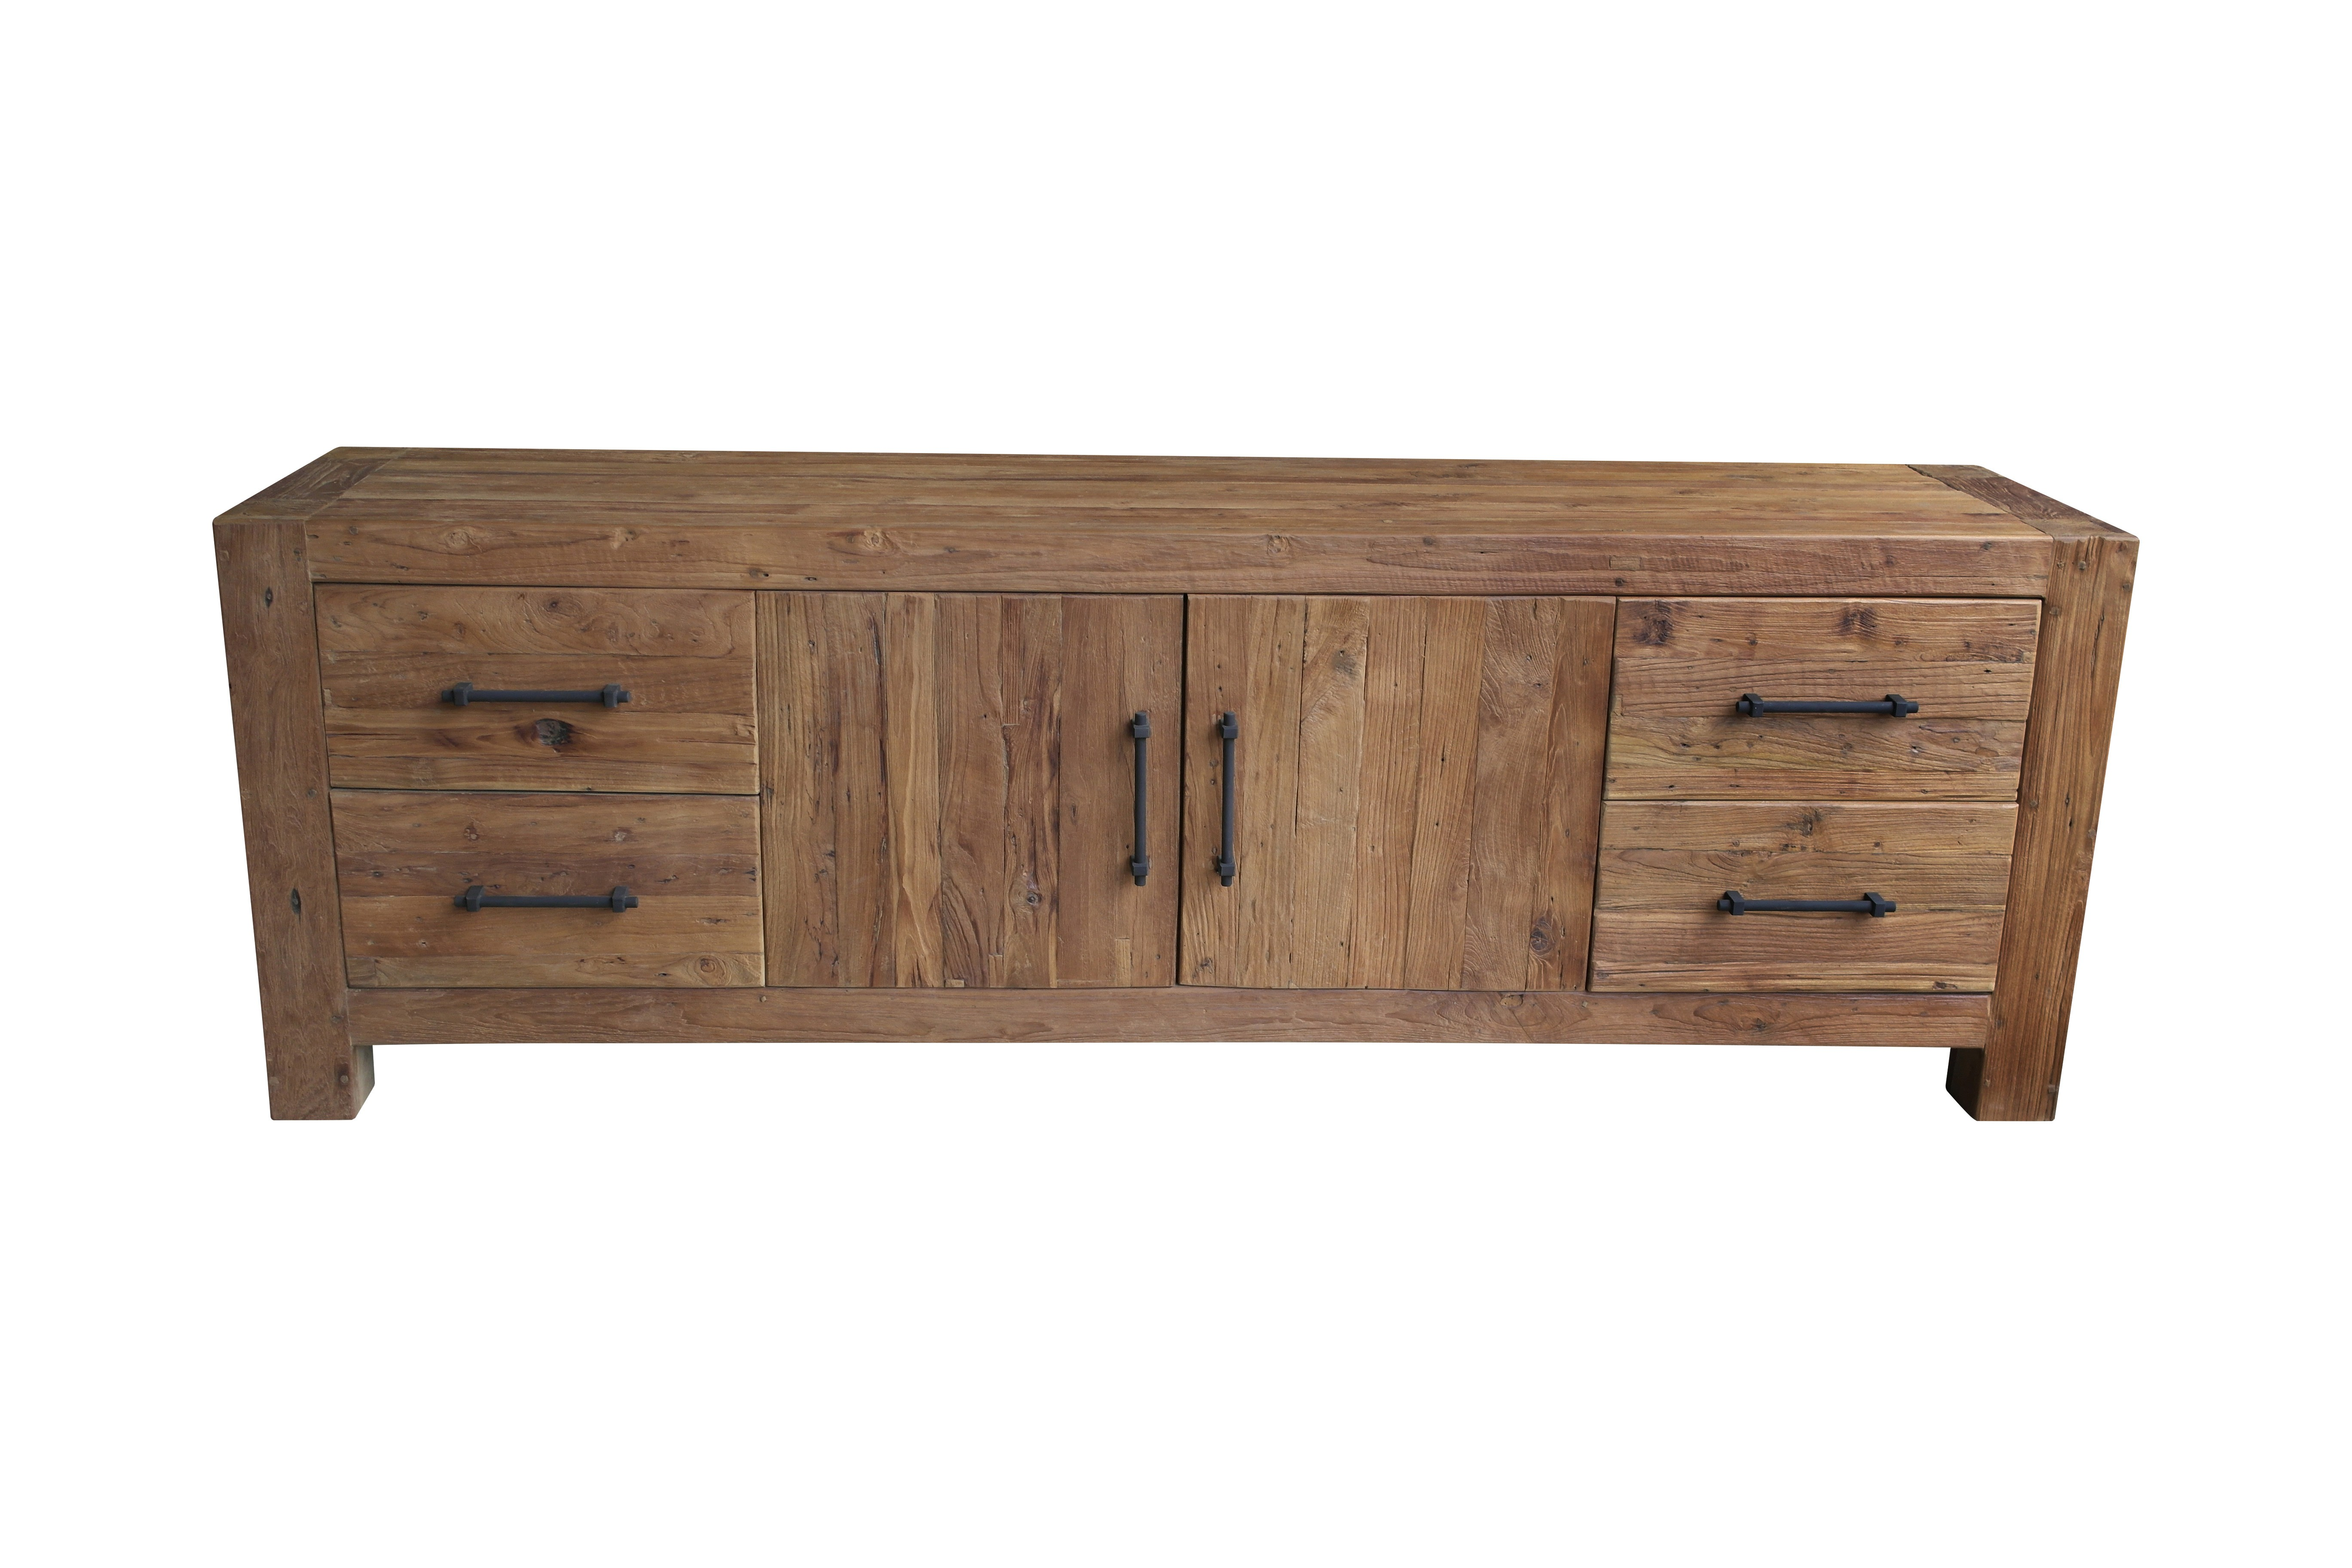 Sit Teak Holz Lowboard Banda 2-türig